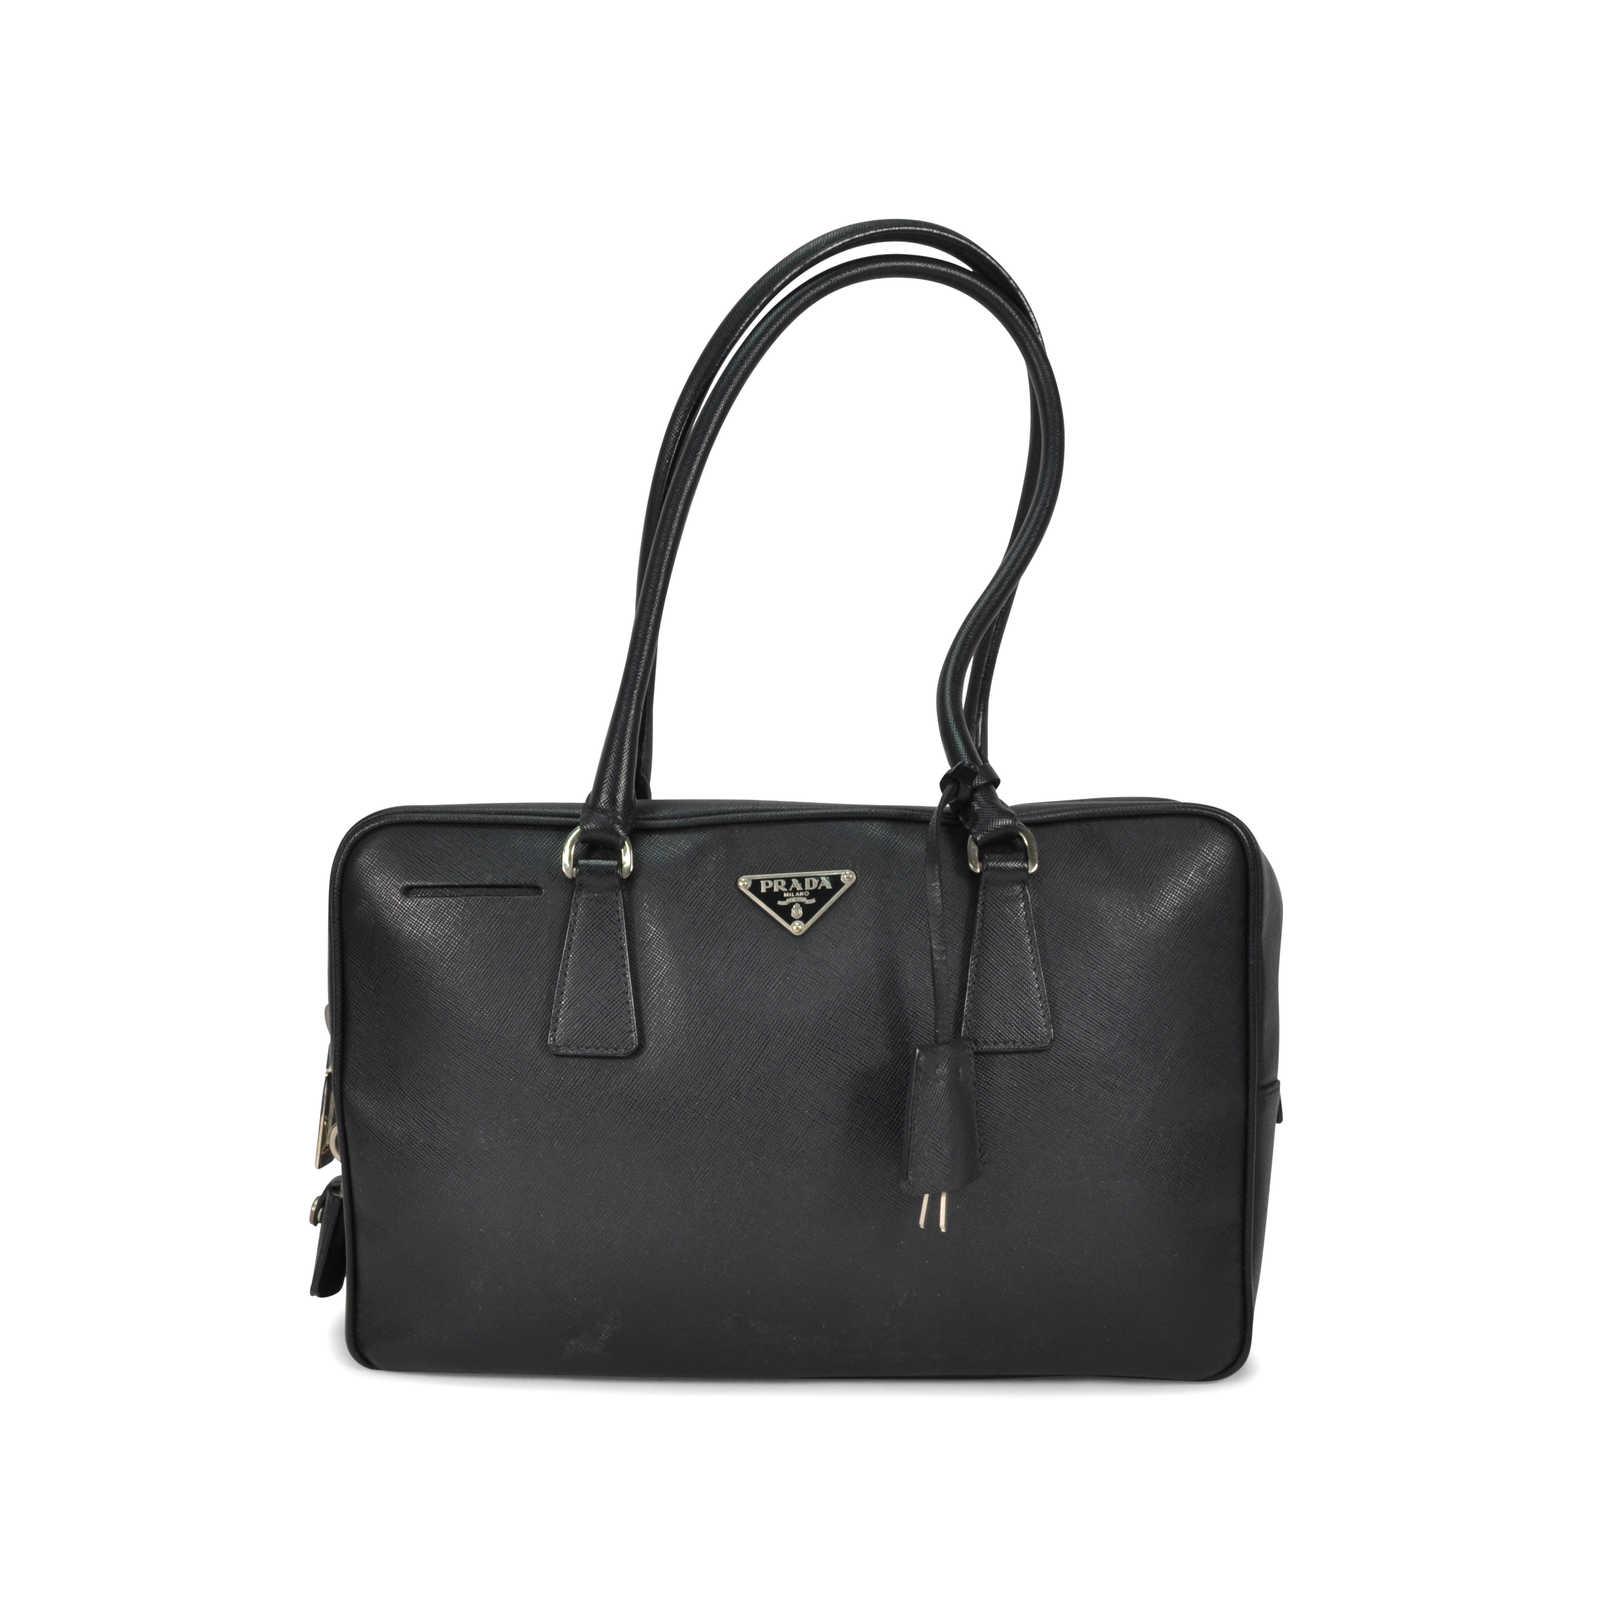 817dcc4dd60f Authentic Second Hand Prada Saffiano Shoulder Bag (PSS-279-00005) -  Thumbnail ...